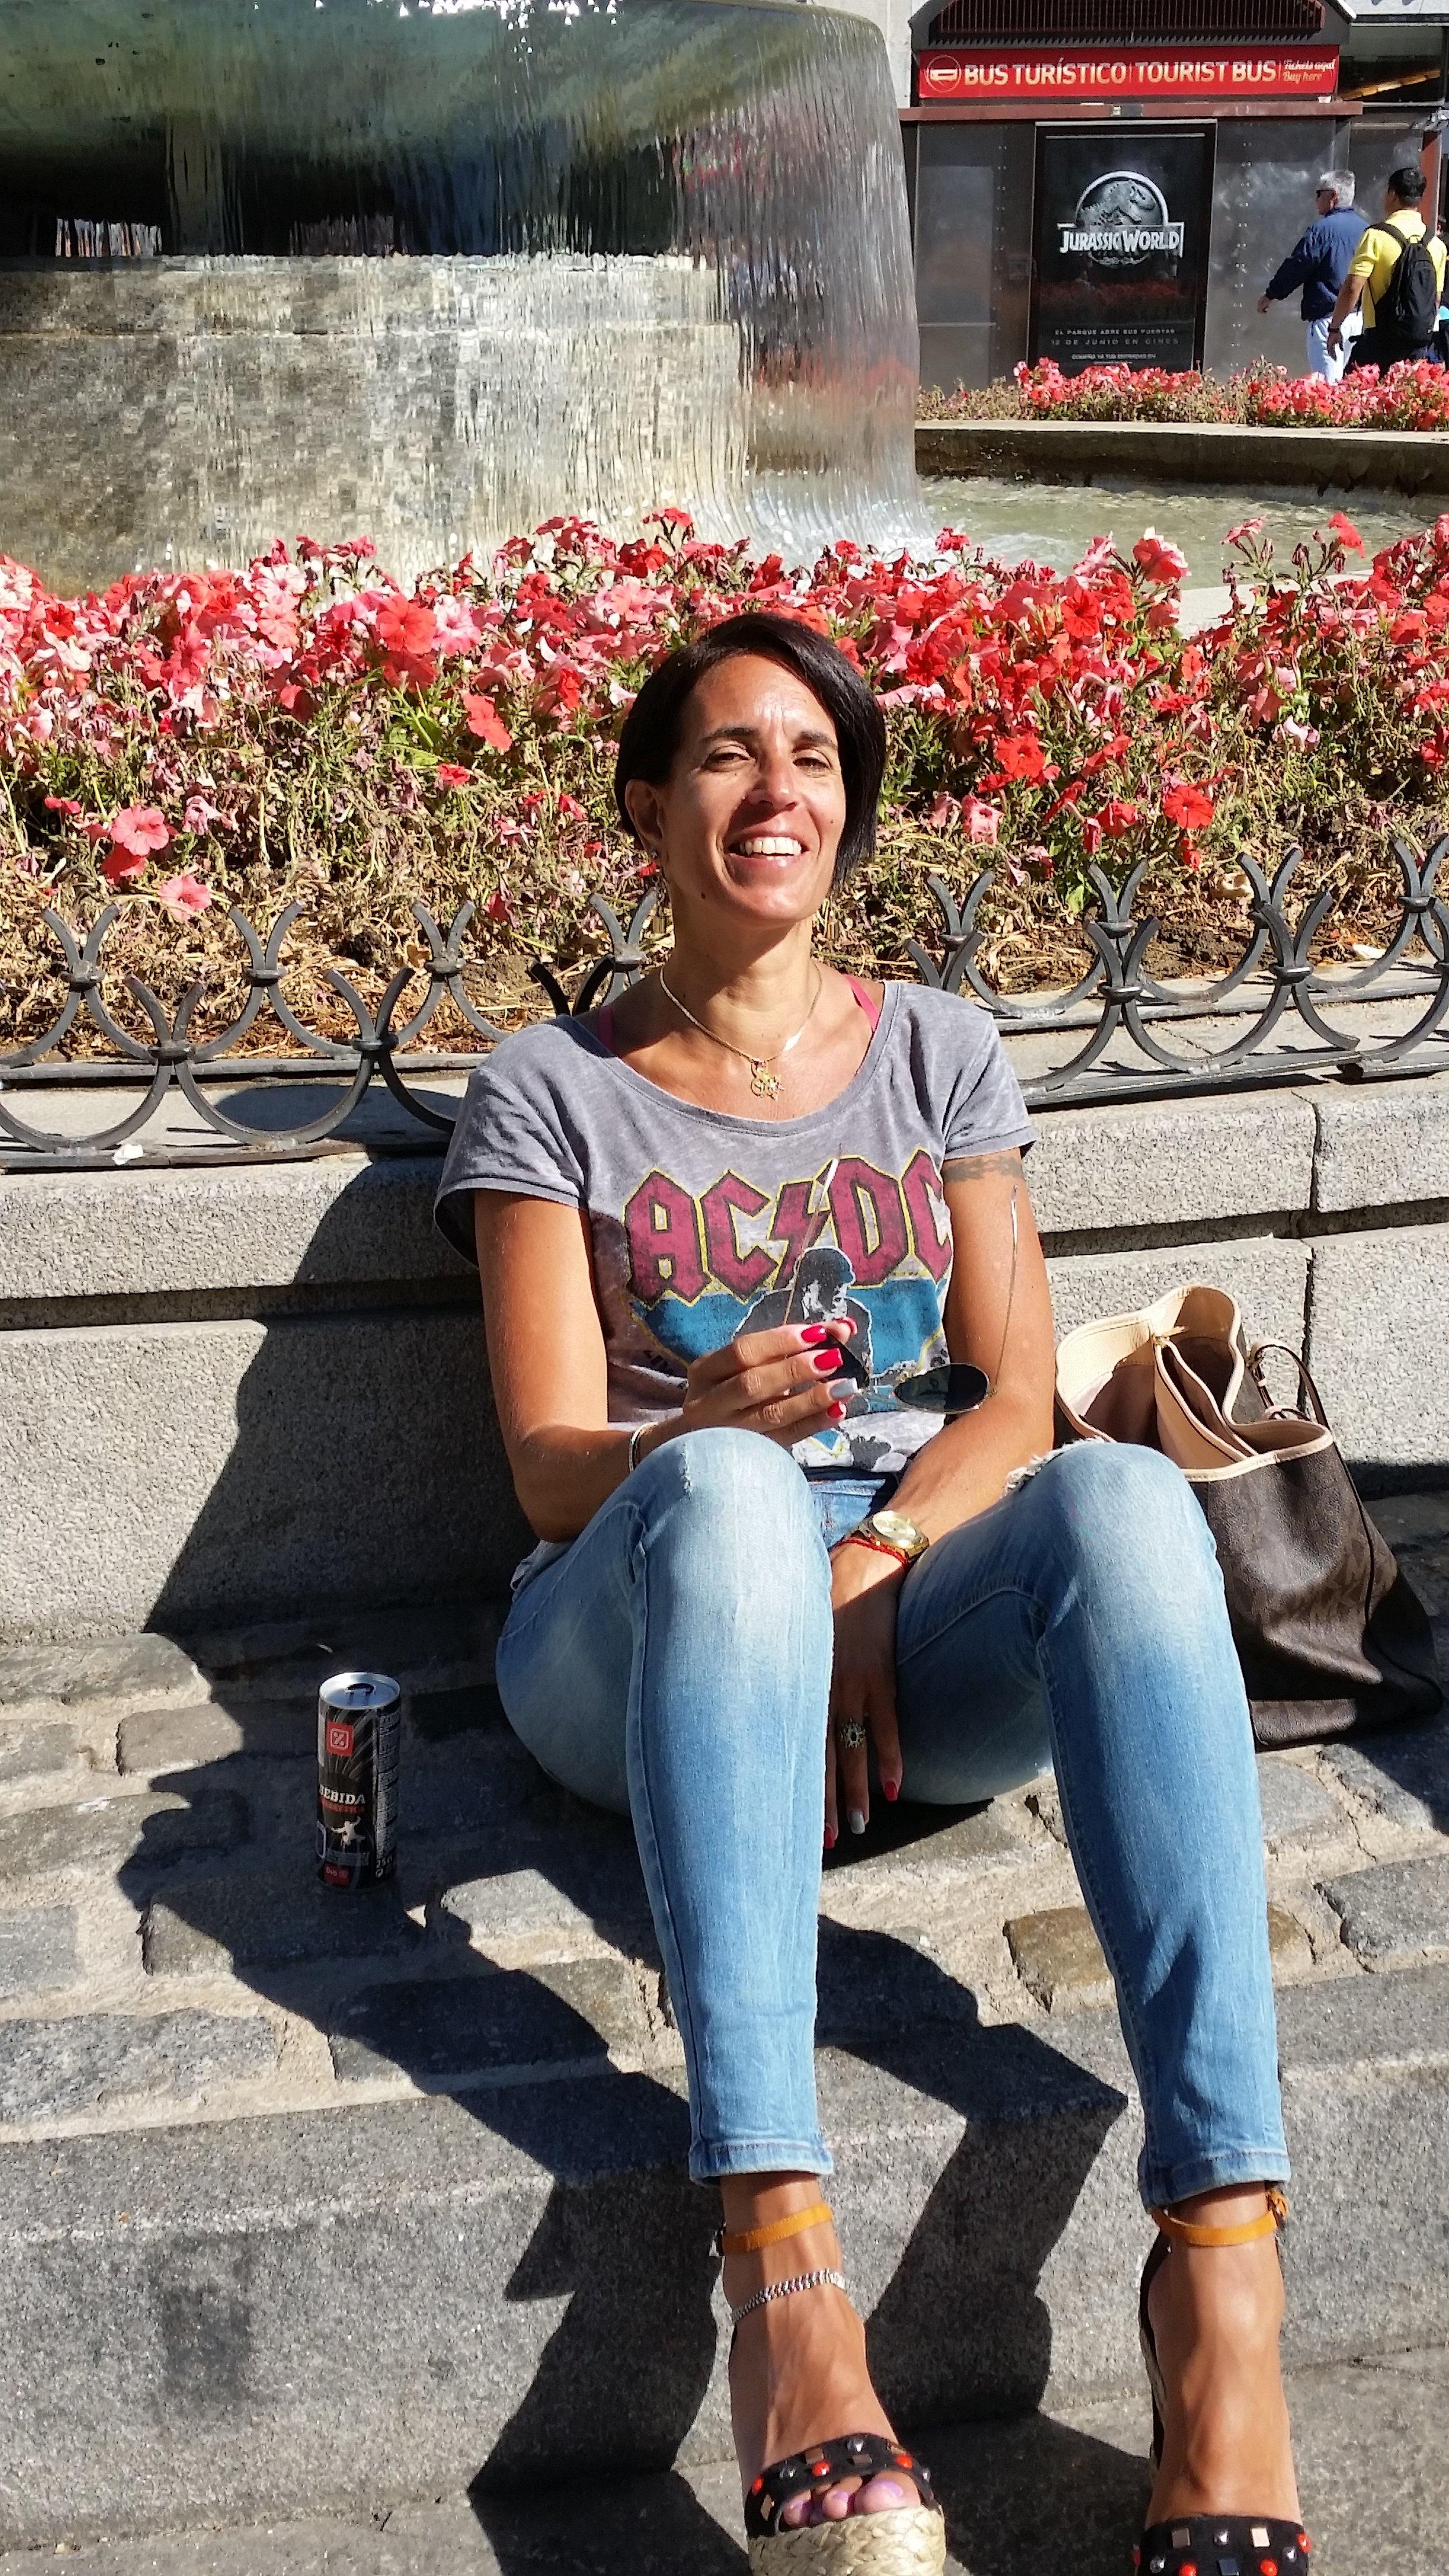 My favorite spot in Madrid, Puerta del Sol